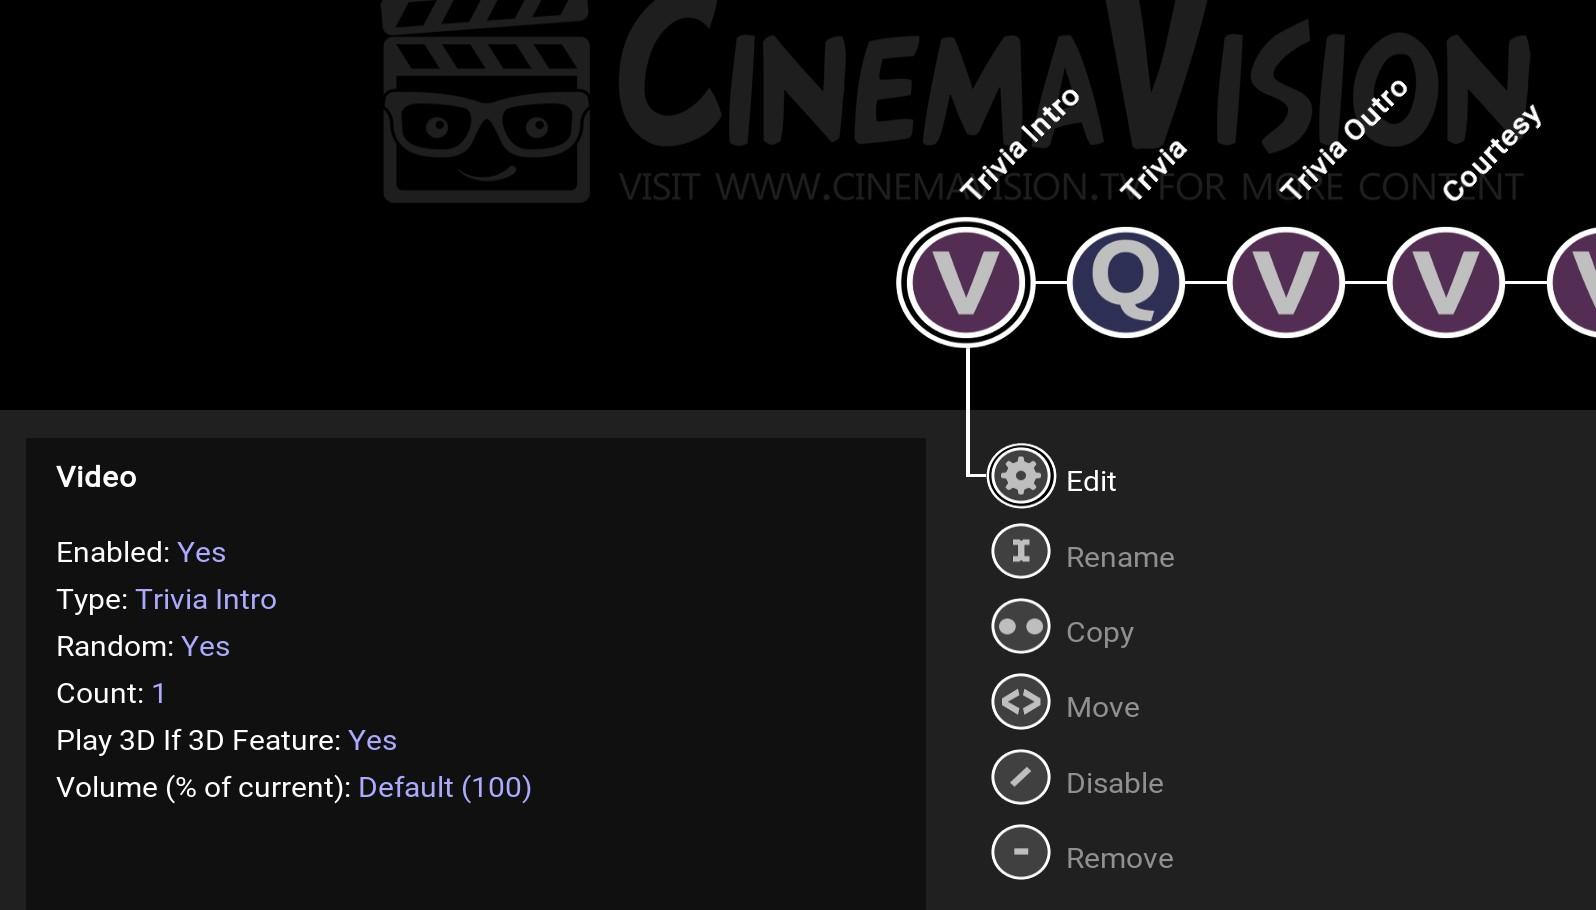 kino-feeling_cinemavision